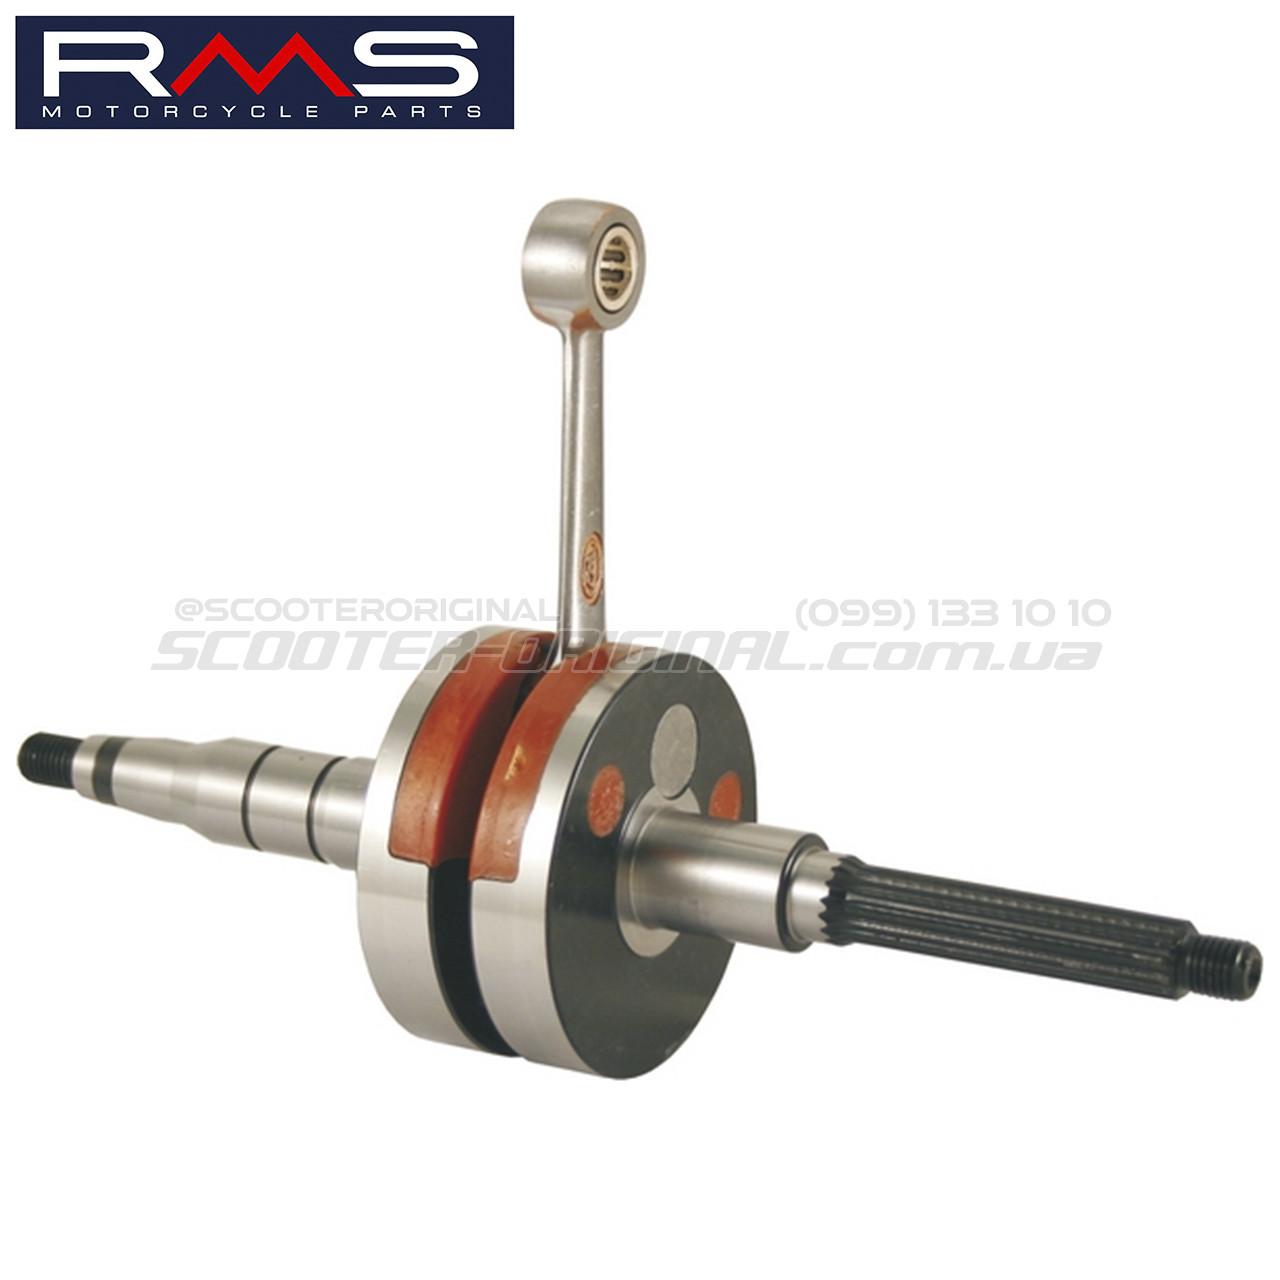 Коленвал RMS Racing (HPC) Minarelli Horizontal (Yamaha) палец Ø 10 мм